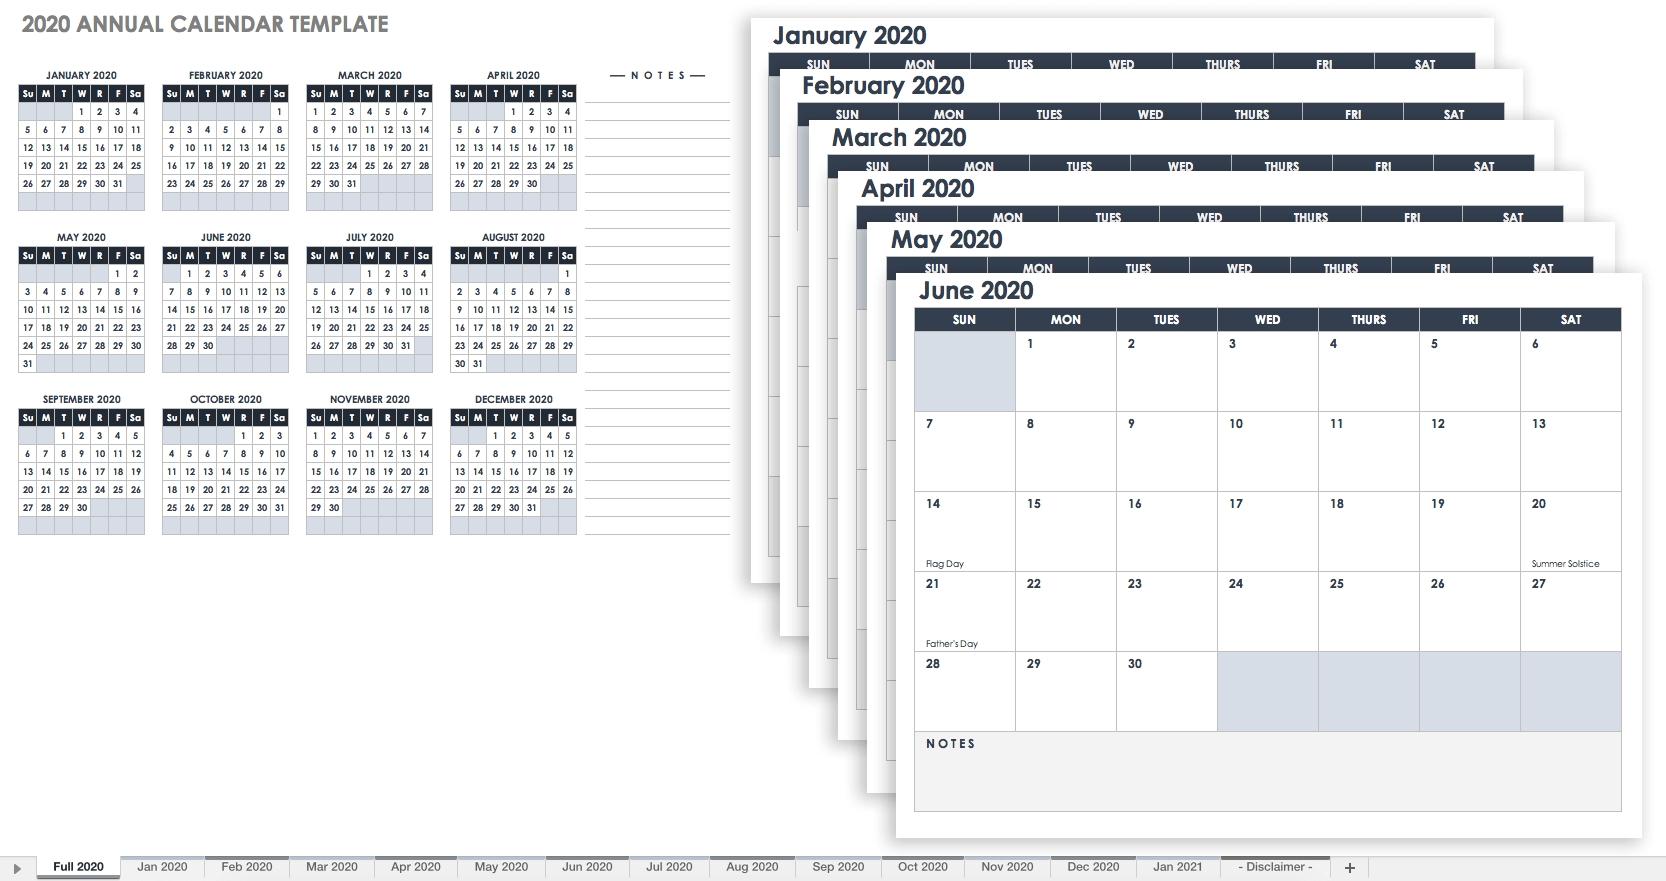 Free Excel Calendar Templates-3 Month Editable Calendar 2020 Template